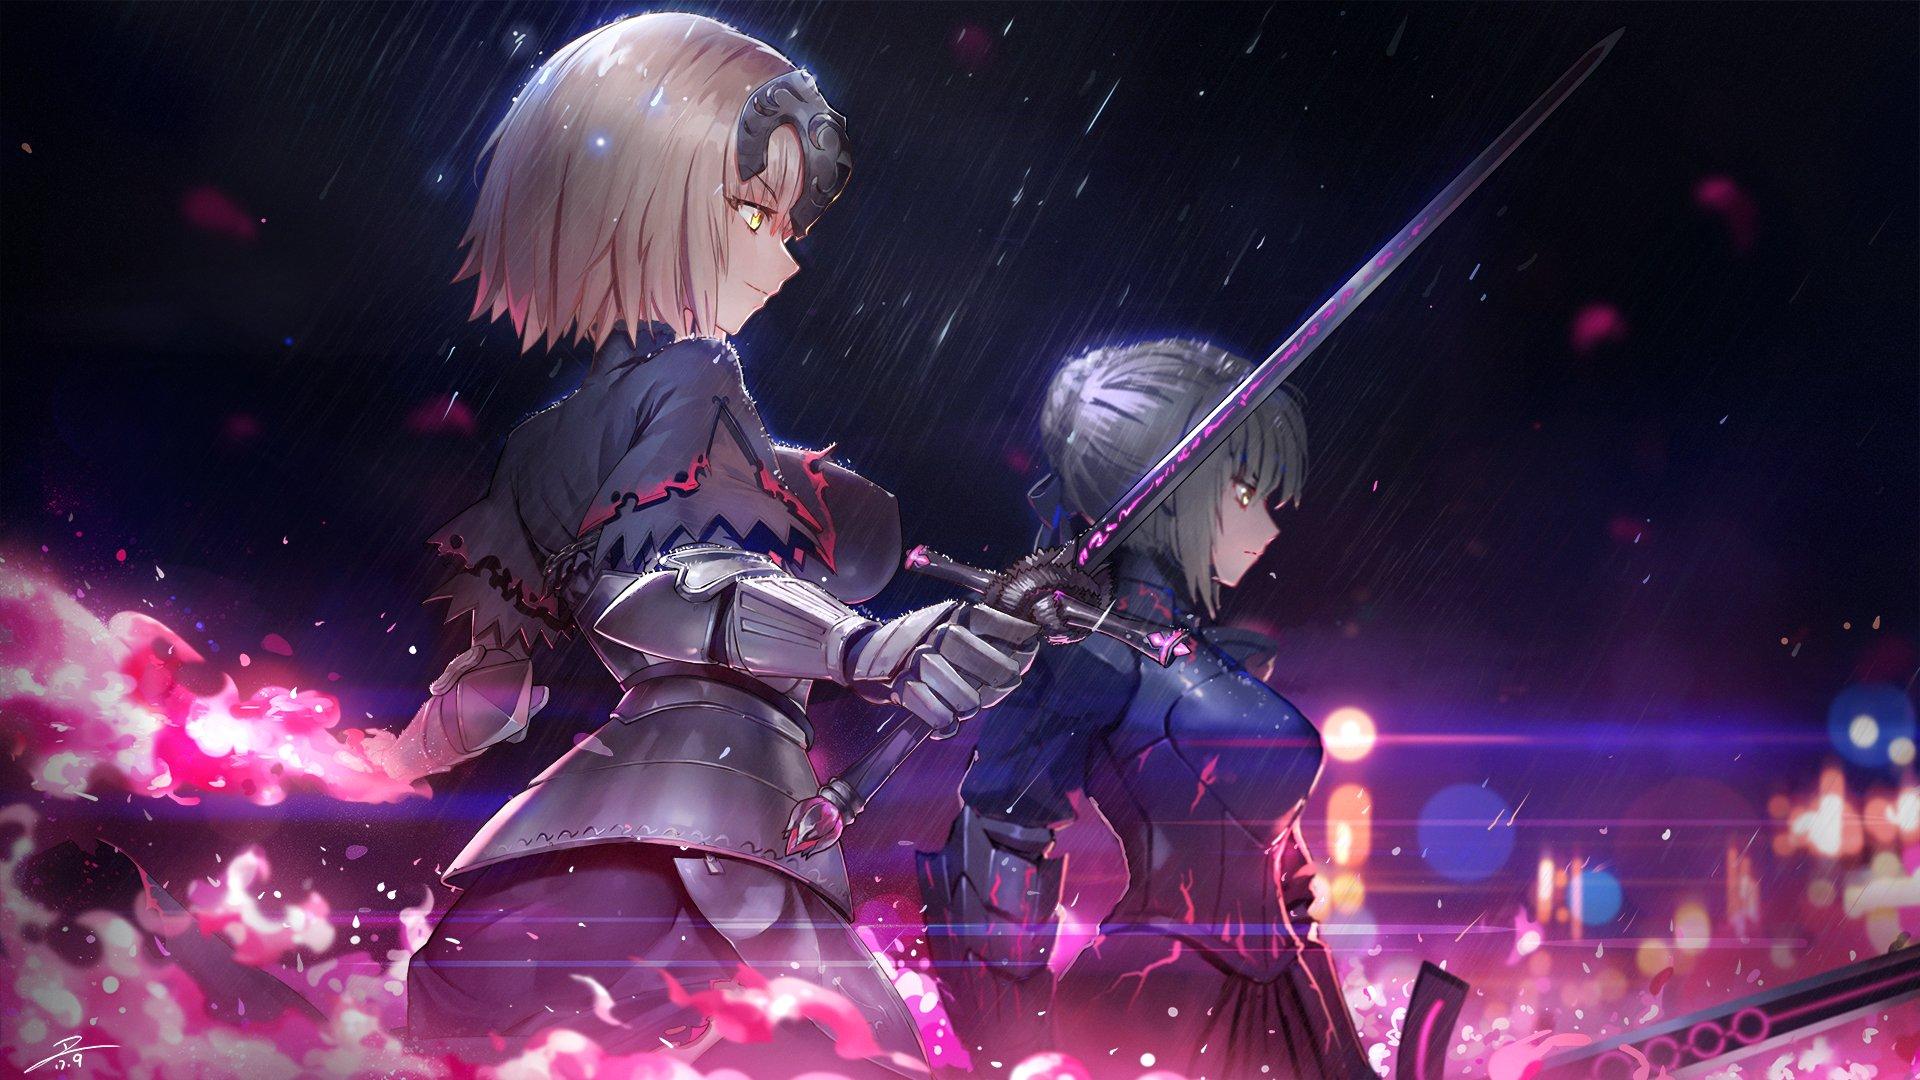 Anime Wallpaper Fate Grand Order